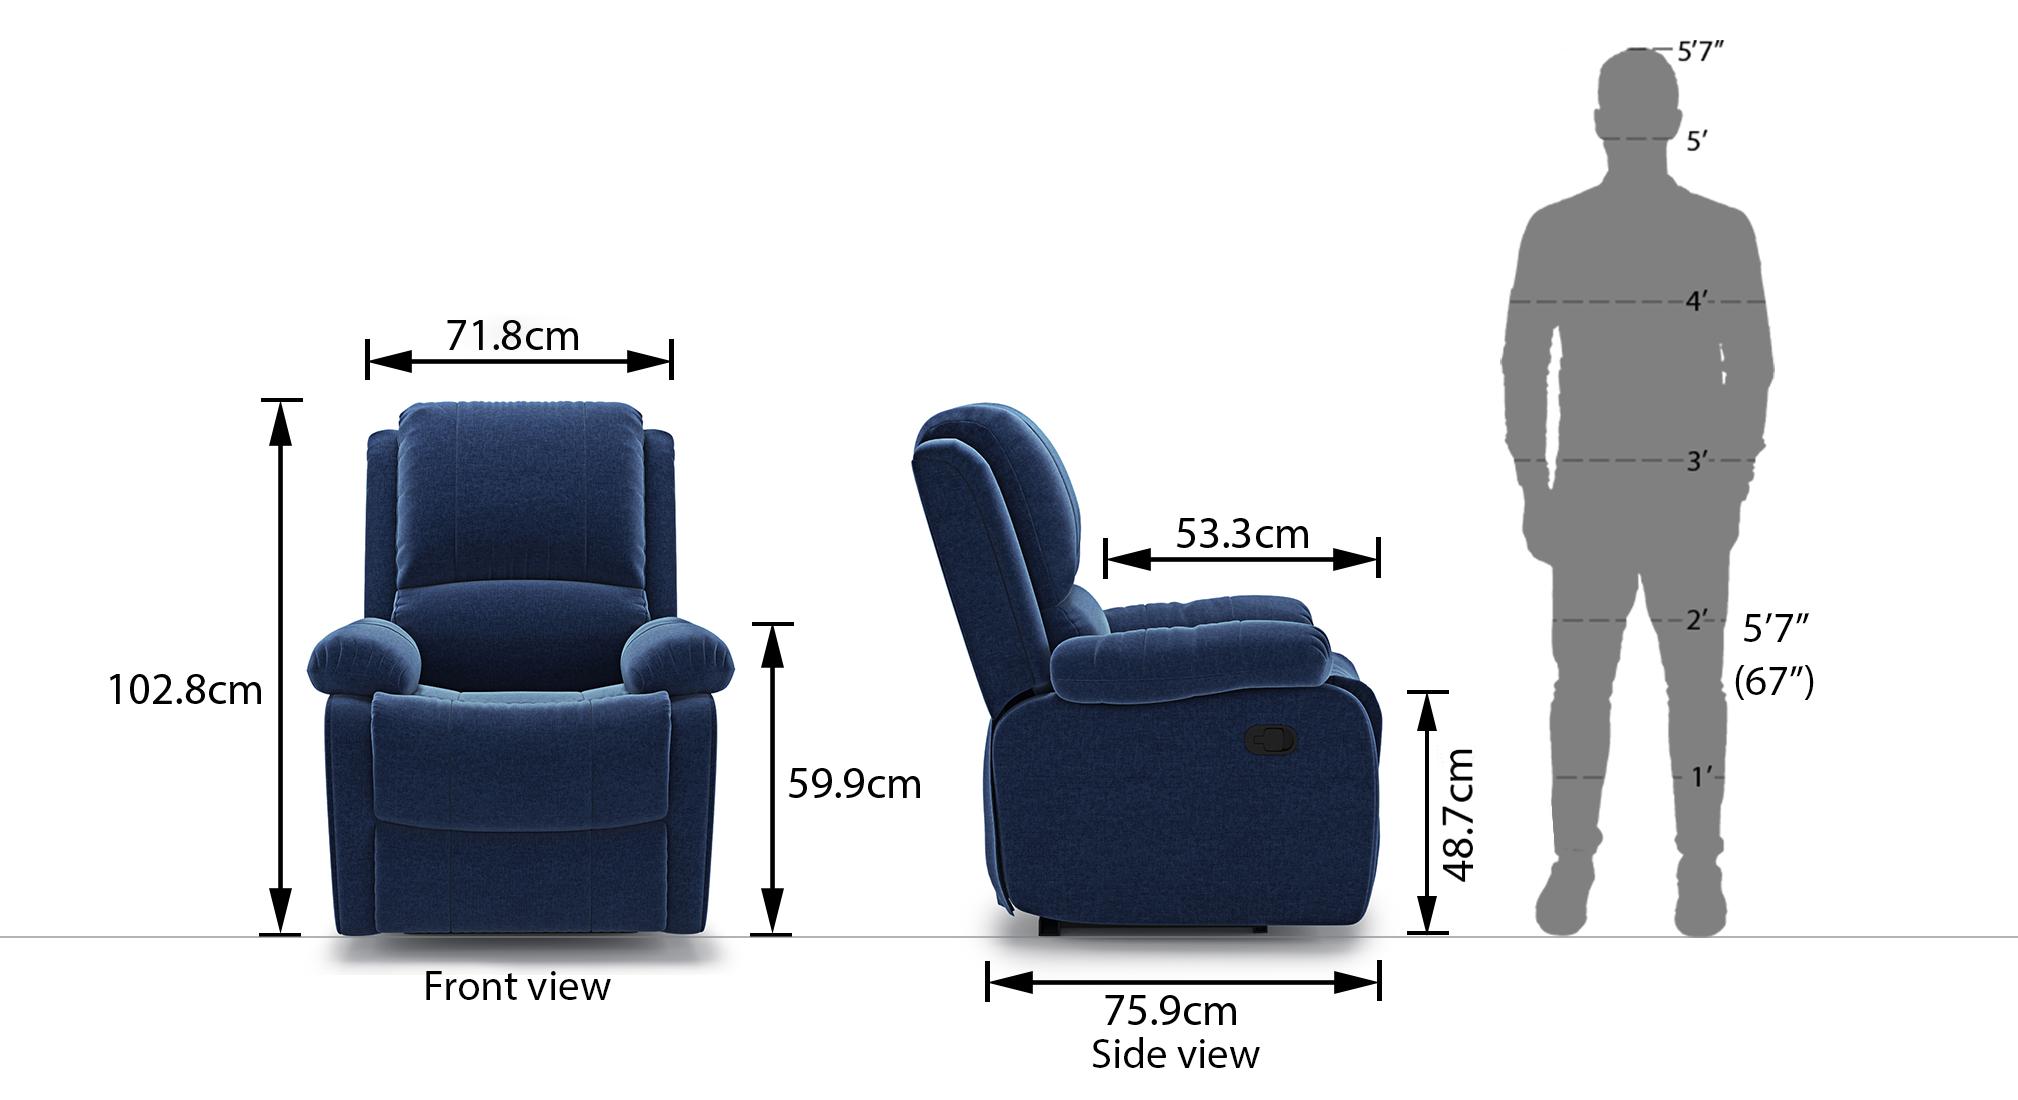 Lebowski single seater co